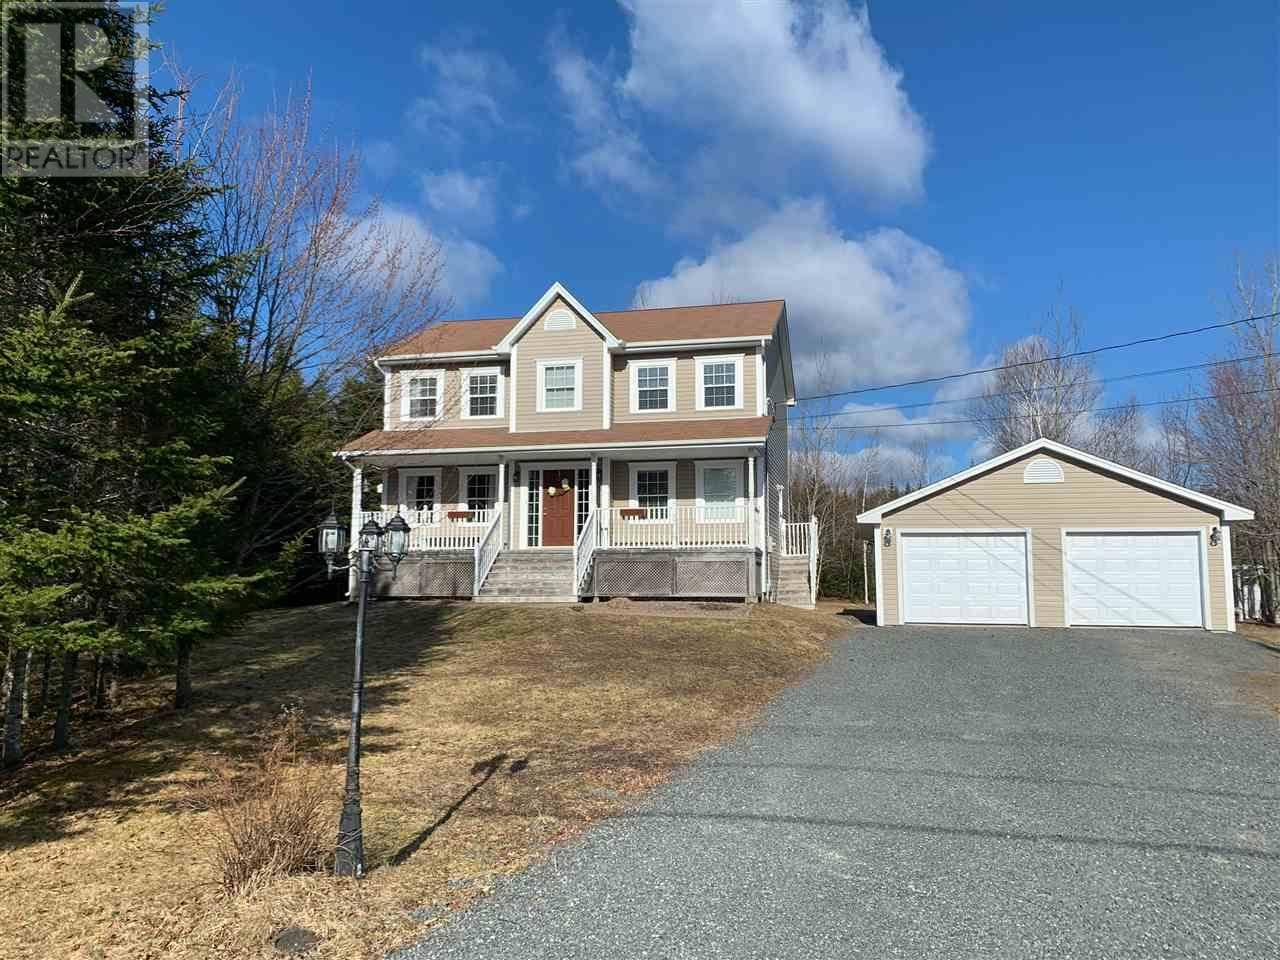 House for sale at 180 Bishops Gate Rd Hammonds Plains Nova Scotia - MLS: 202005783